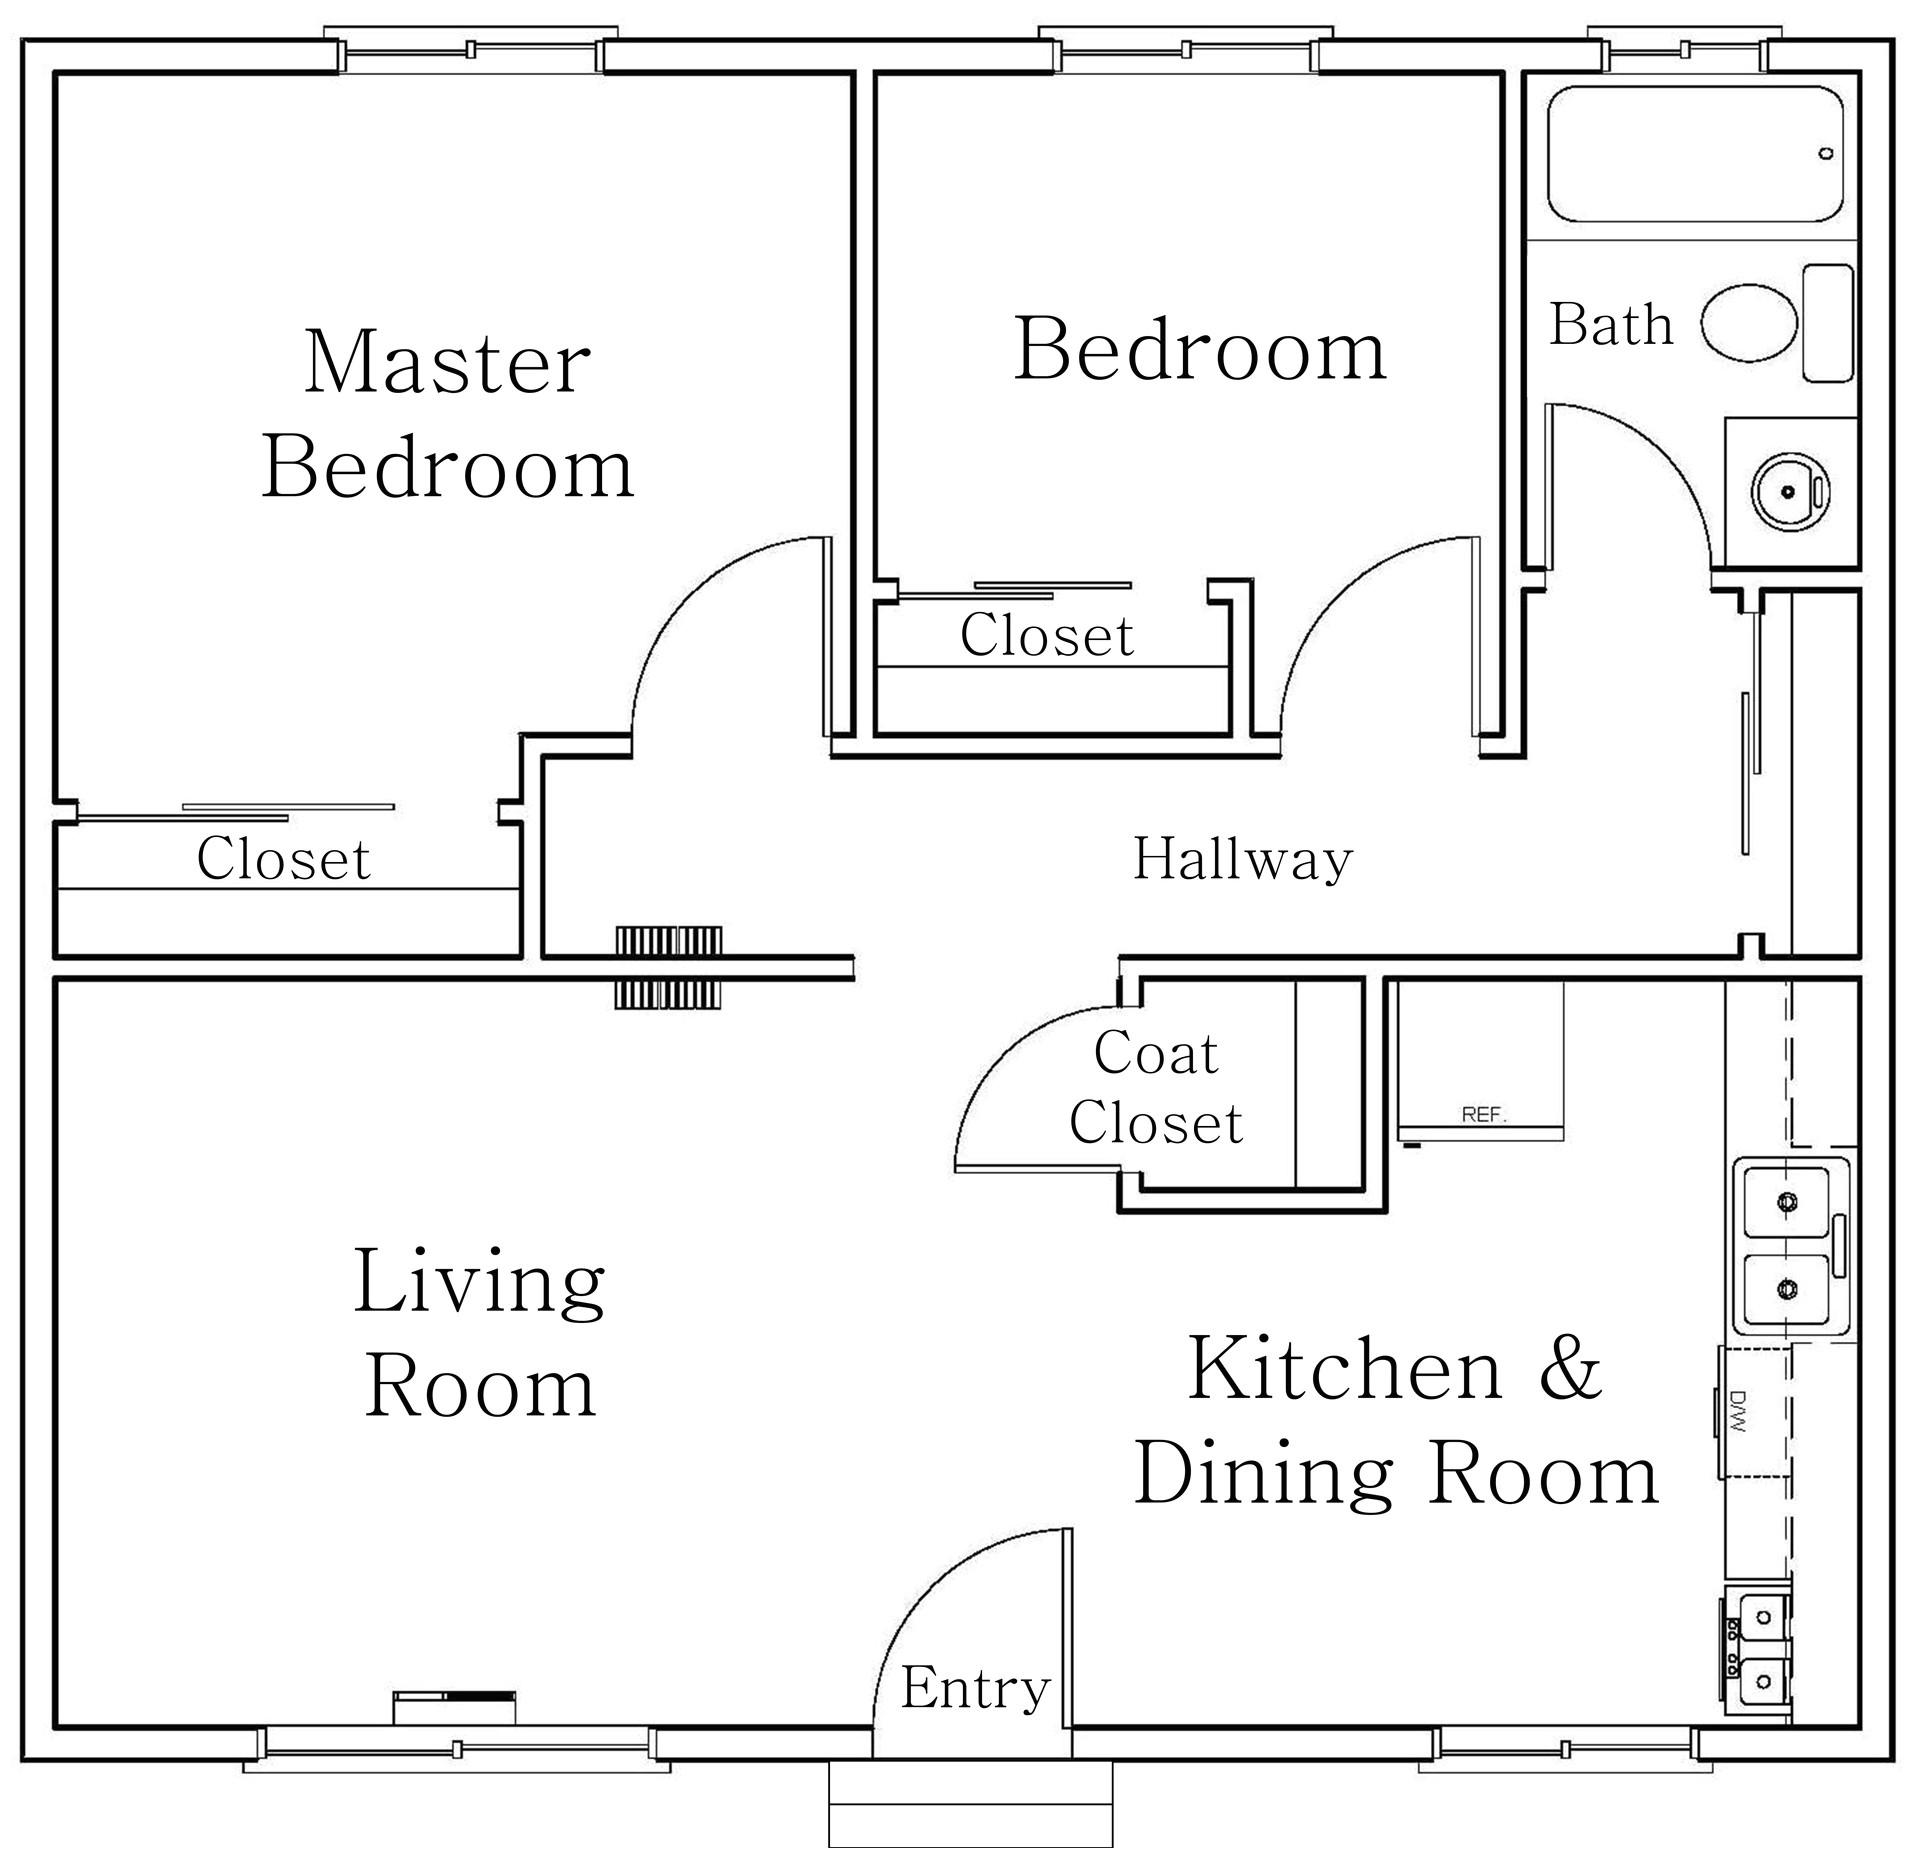 Residential Home Plans Cad Dwg Drawings Garage Studio Plans Joy Studio Design Gallery Best Design